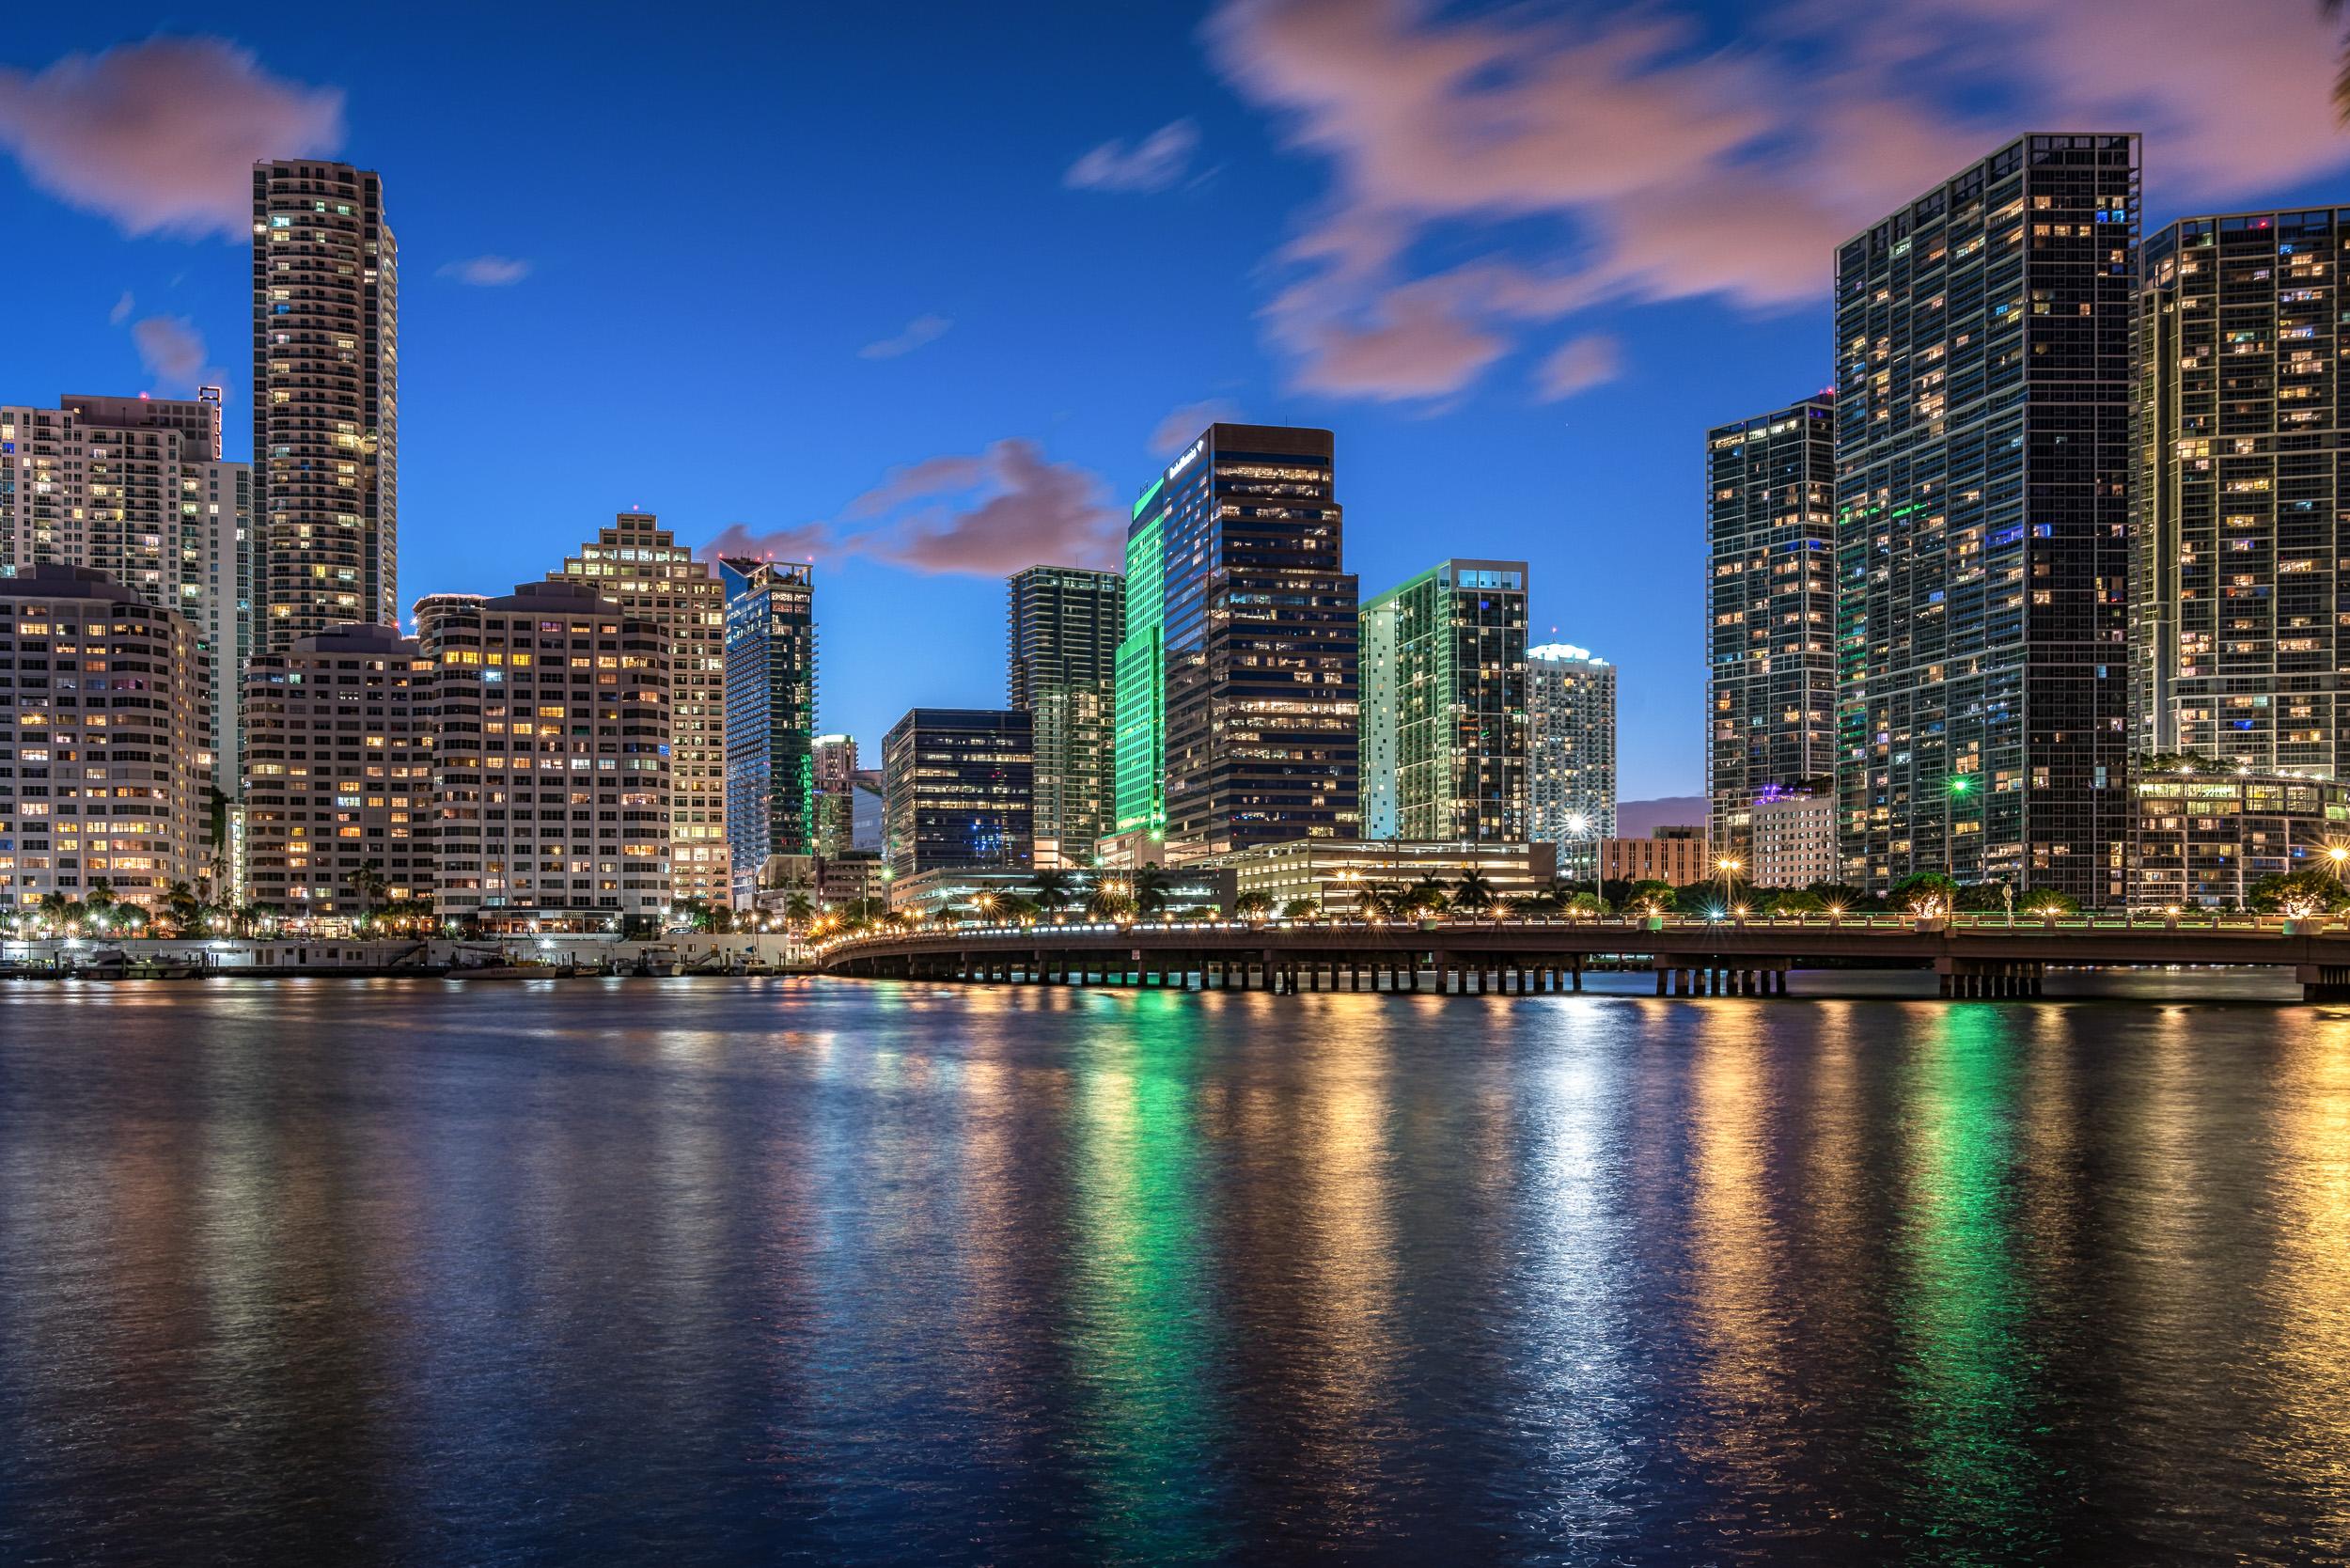 Miami_from_Brikell_Key_3_commercial_photographer_Franklin_Castillo.jpg